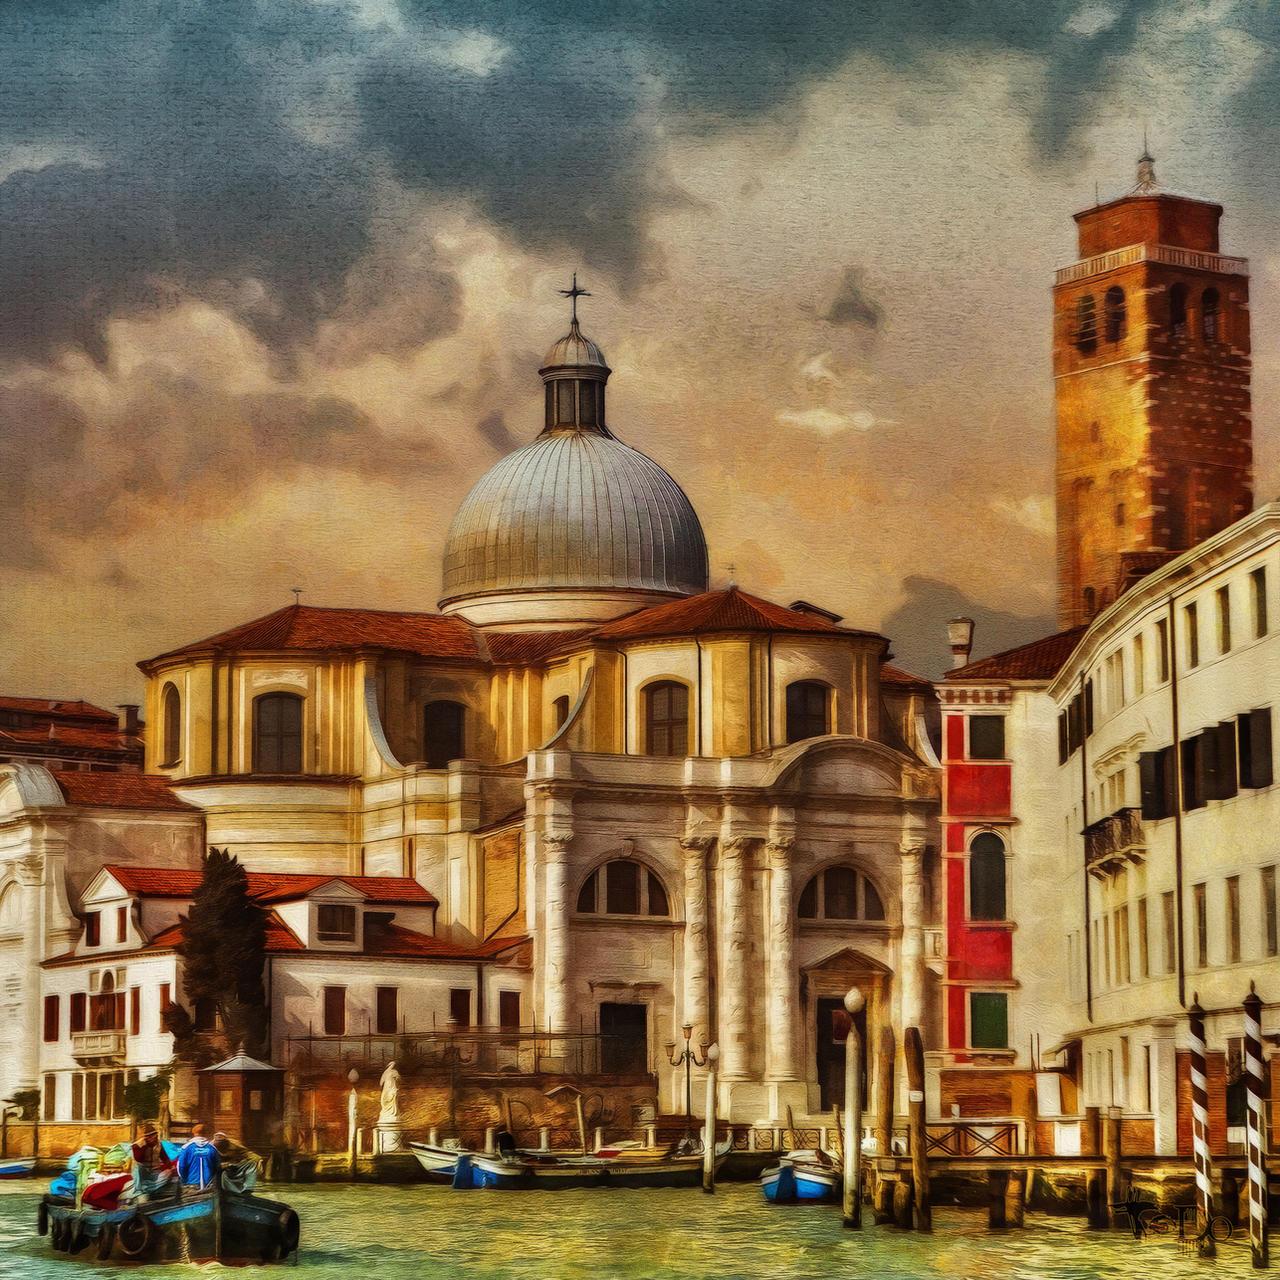 Venice Grand Canal by AlexGutkin